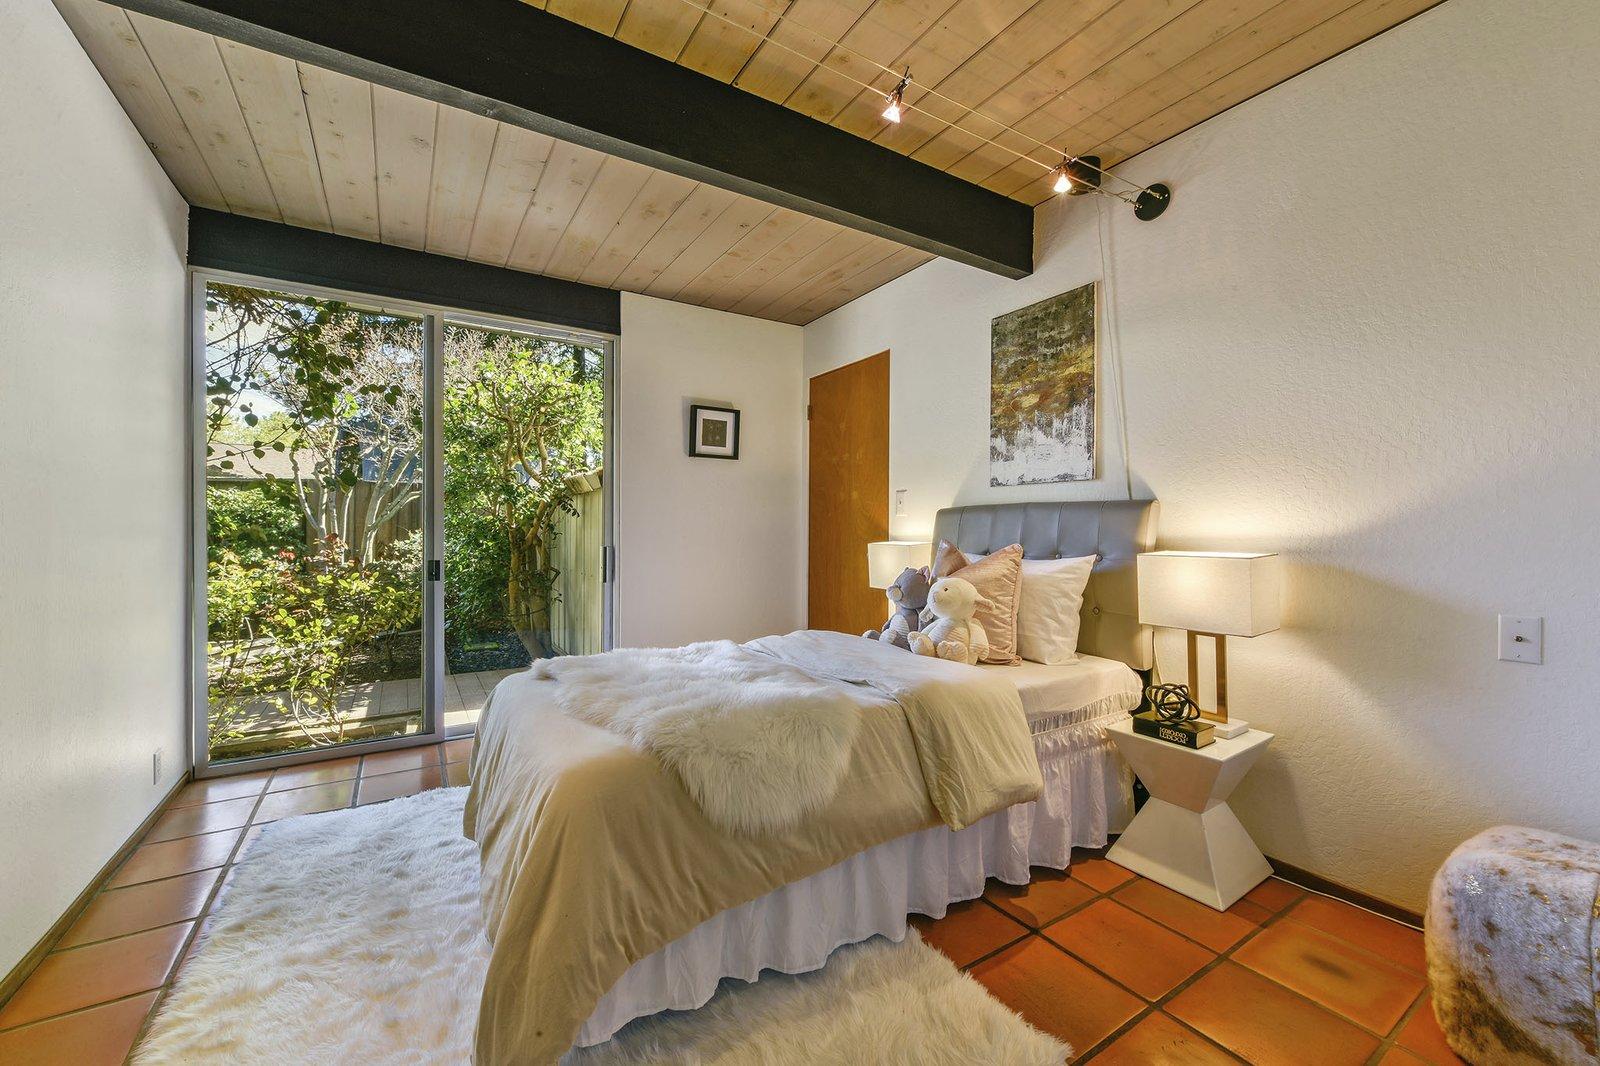 Gallery Eichler bedroom